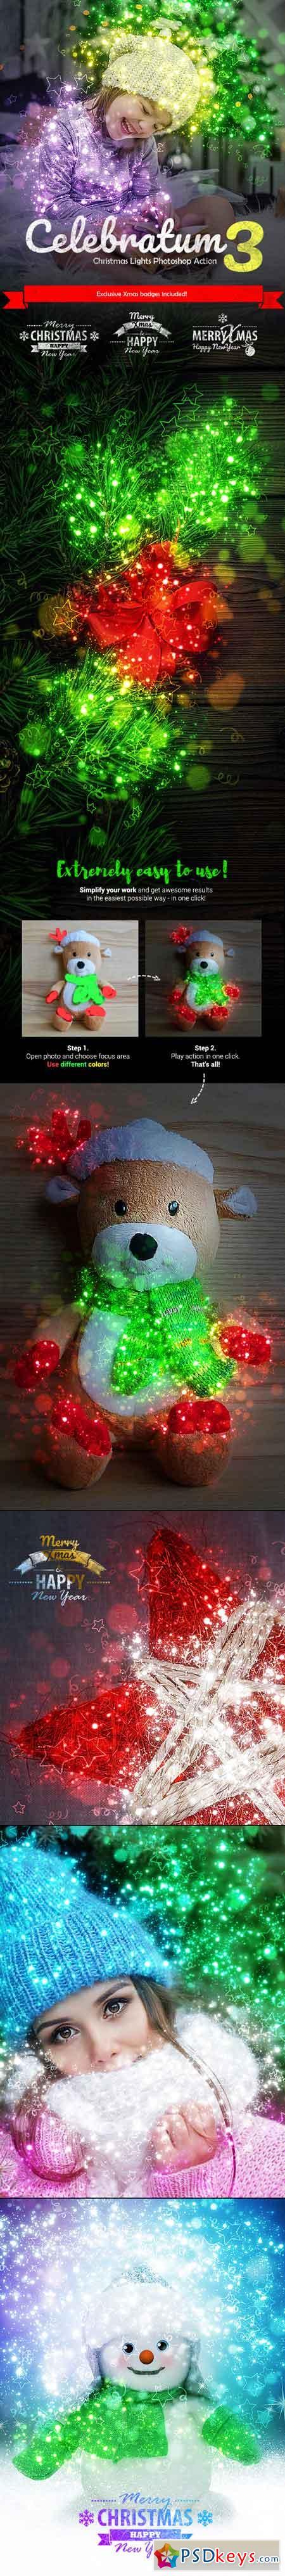 Celebratum 3 - Christmas Lights Photoshop Action 22863016